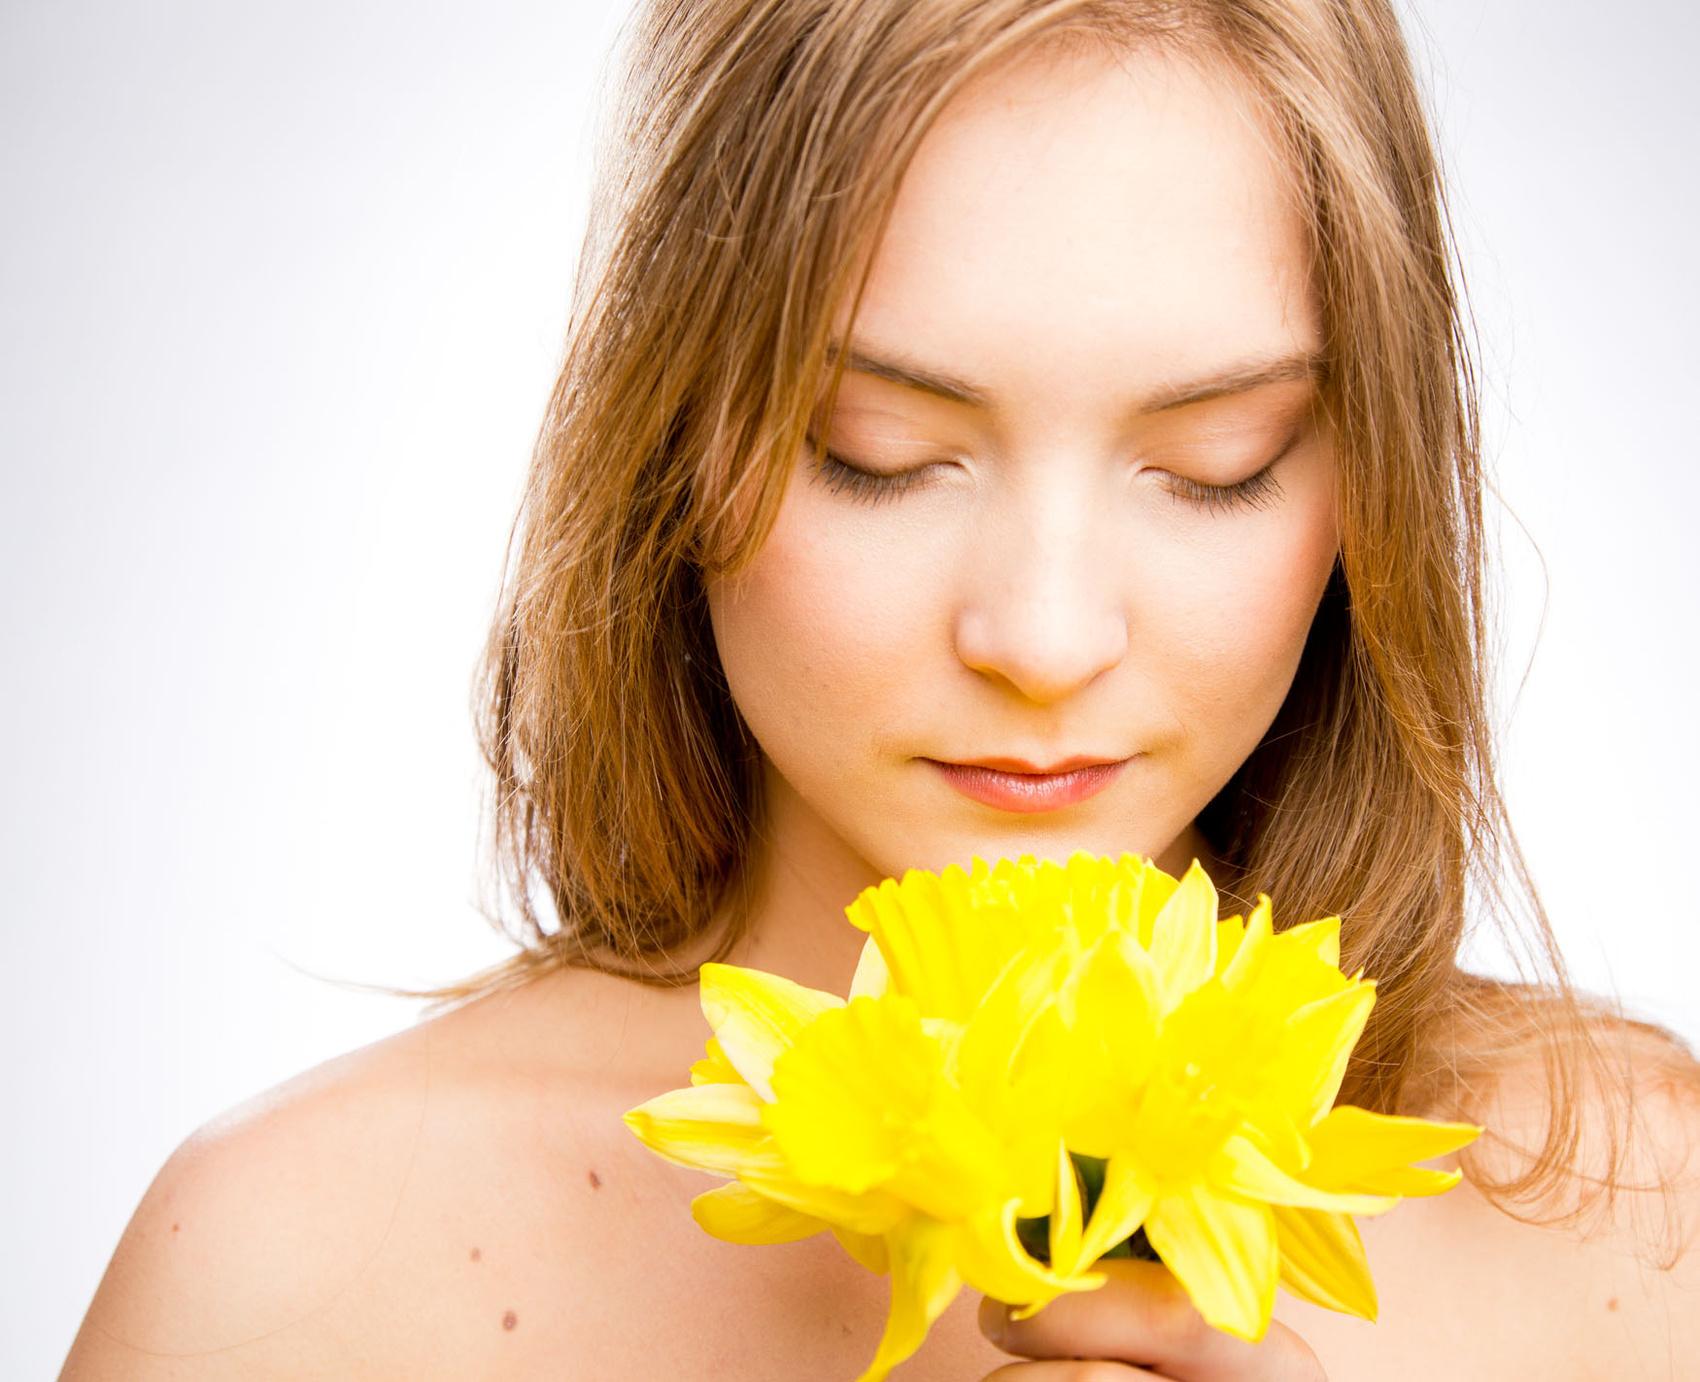 haley yellow.jpg